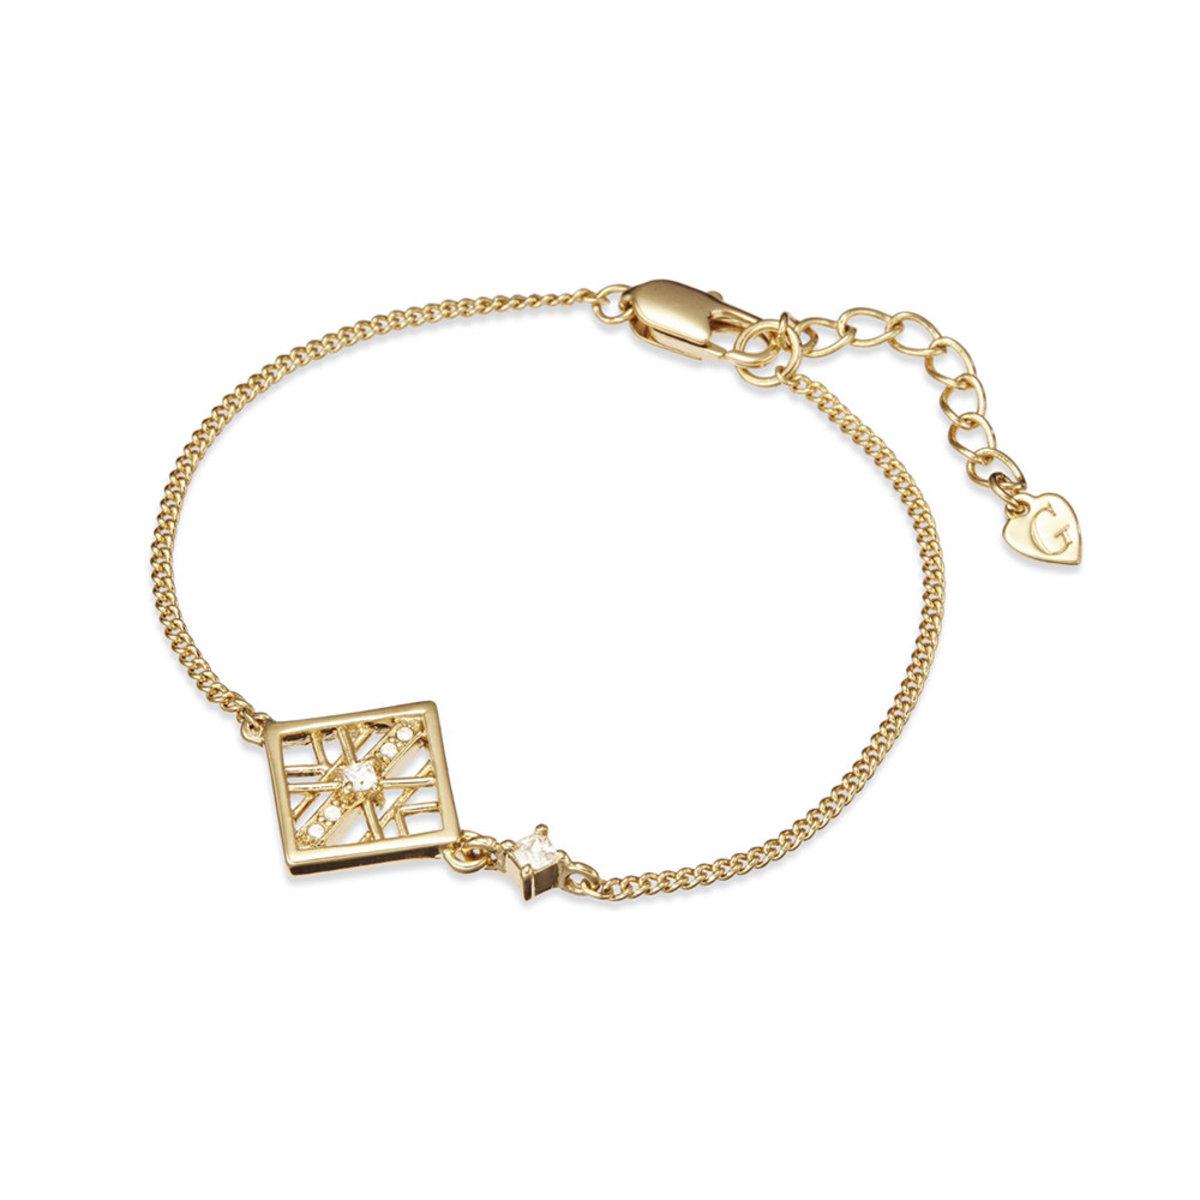 Alluring: gold plating, rhinestone, CZ stone, square pendant necklace